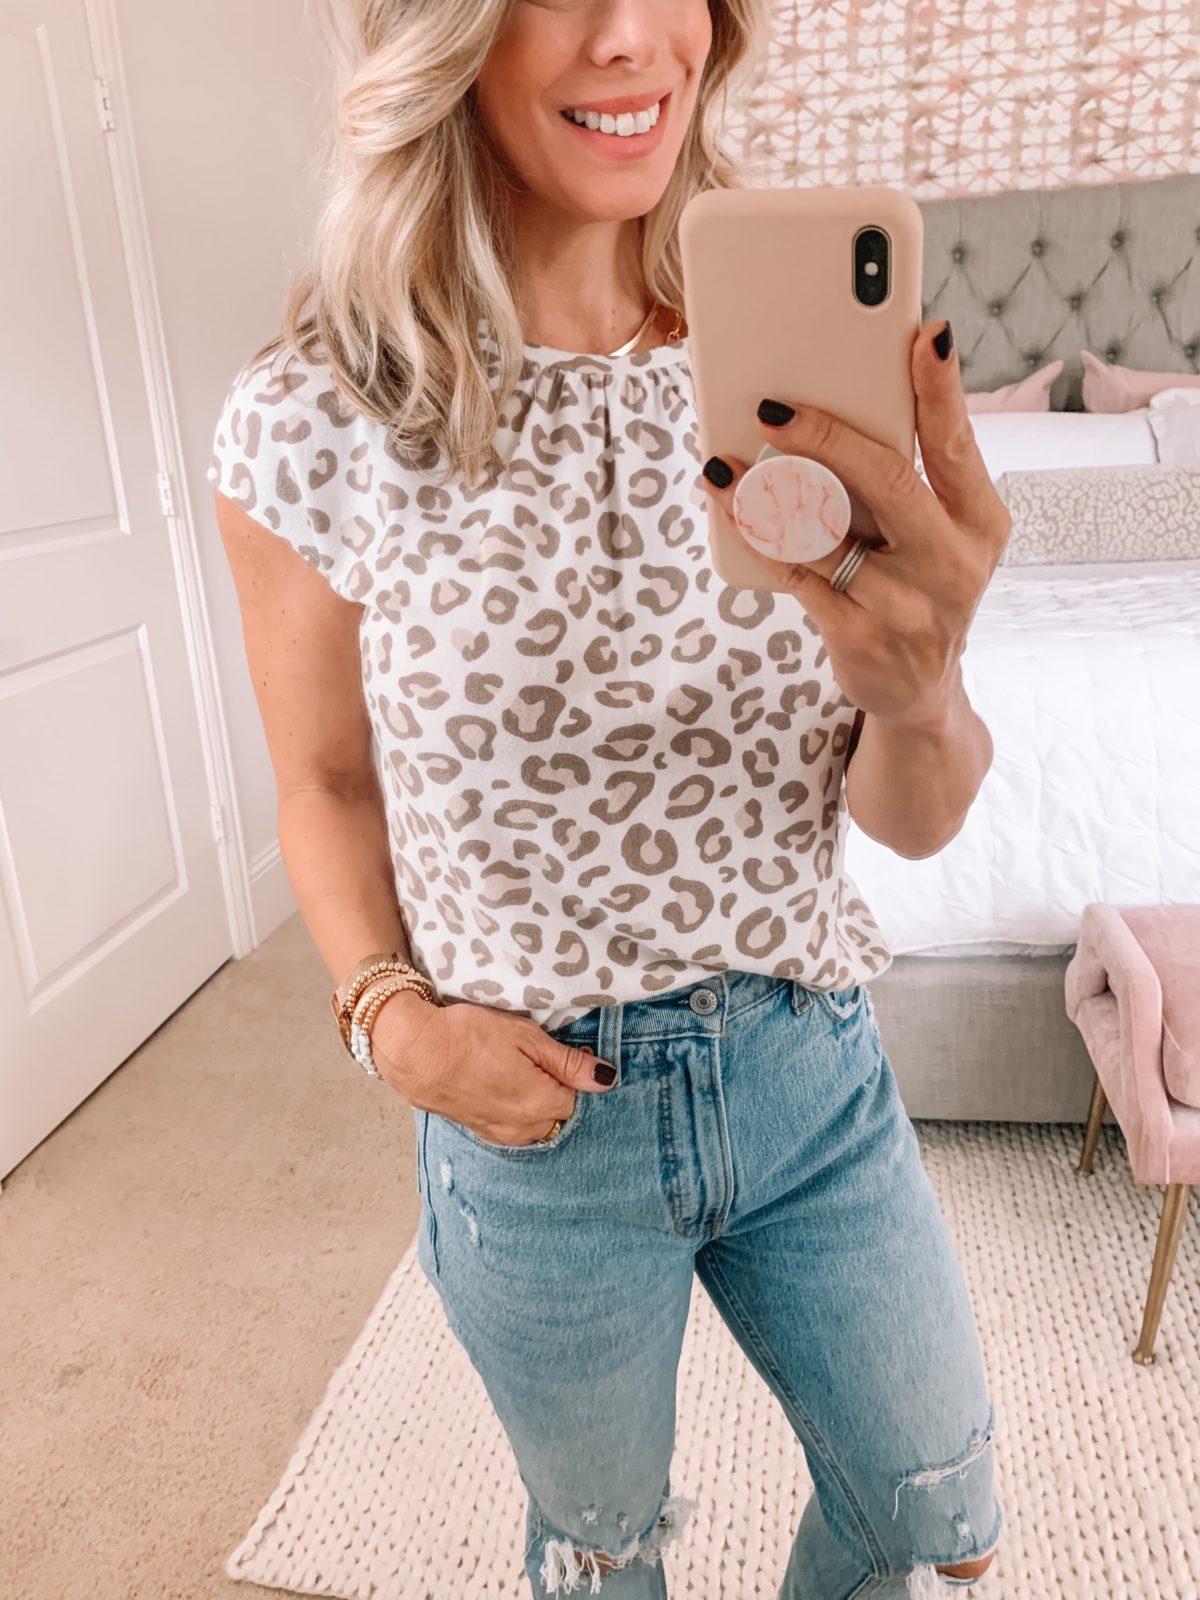 Dressing Room Finds Nordstrom, Gibson, Leopard Top Short Sleeve, Jeans